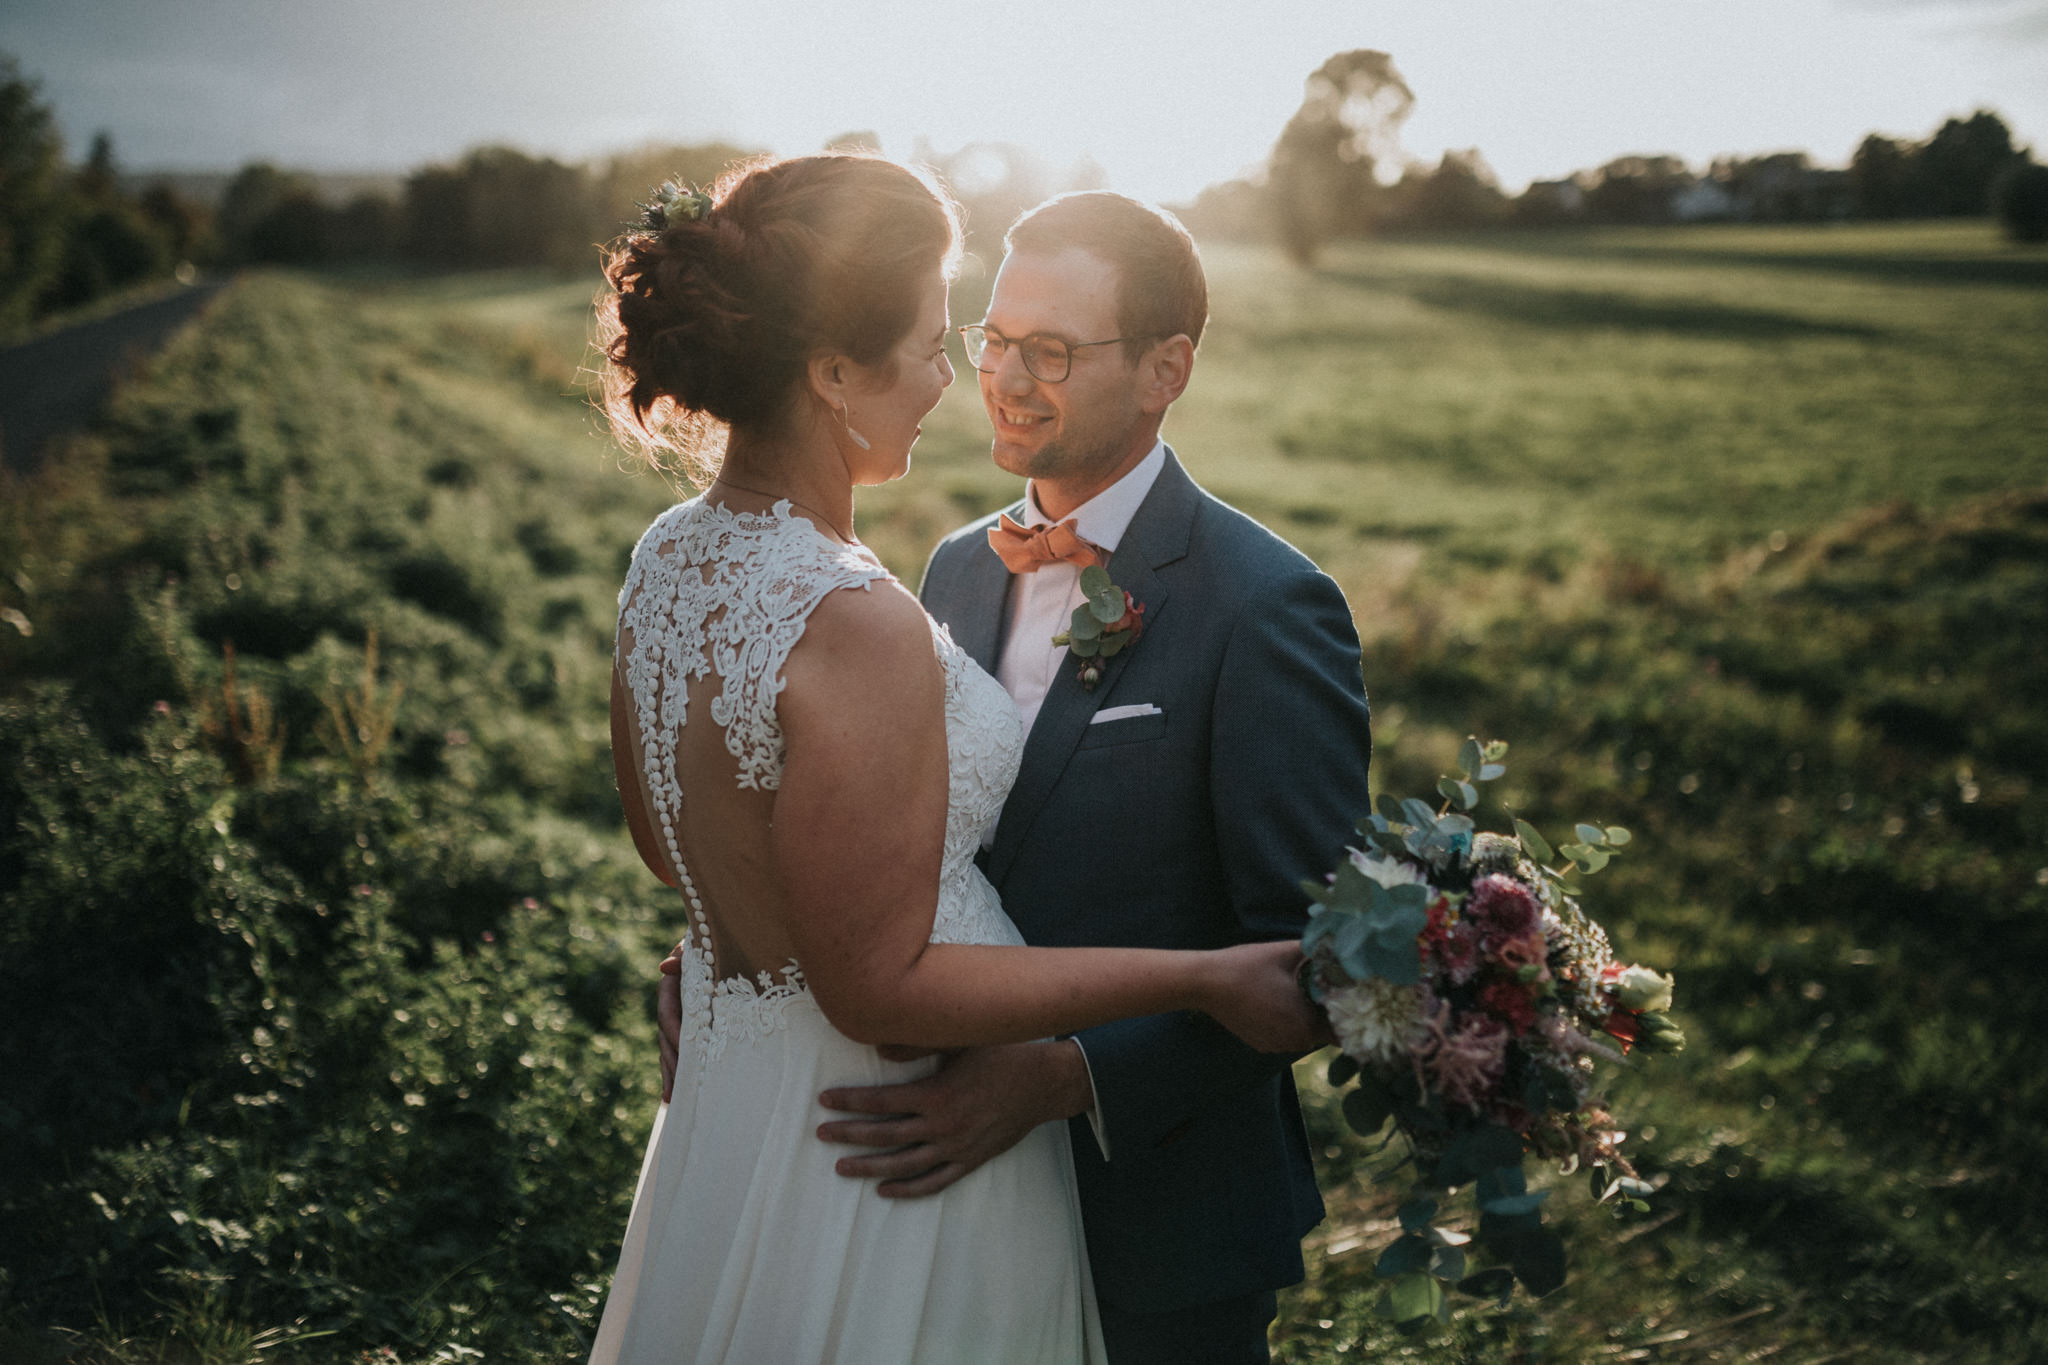 Hochzeitsfotograf-Homberg-52.jpg